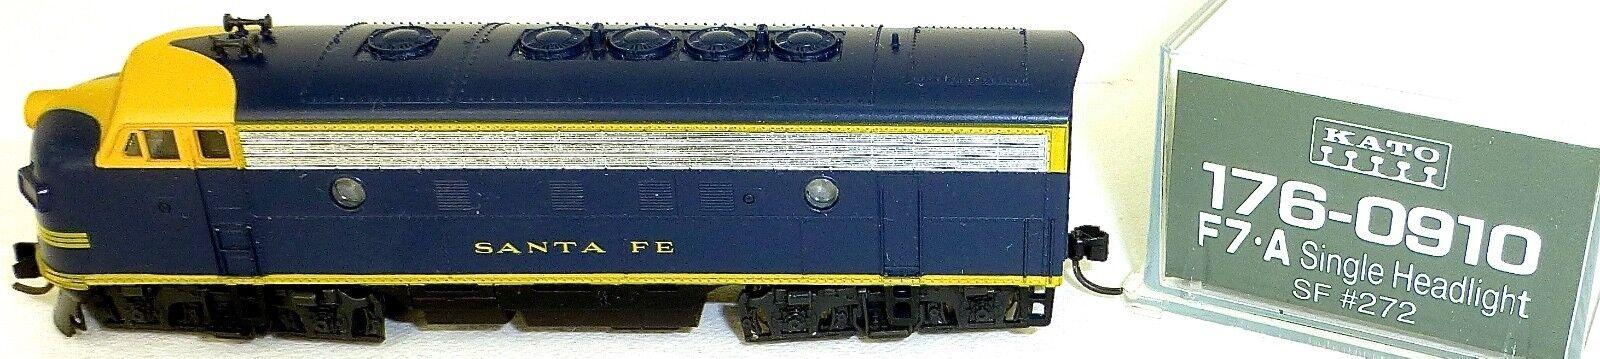 Kato 176-0910 F7A Santa Fe Sf 272 Diesel Locomotive Single Headlight Boxed N